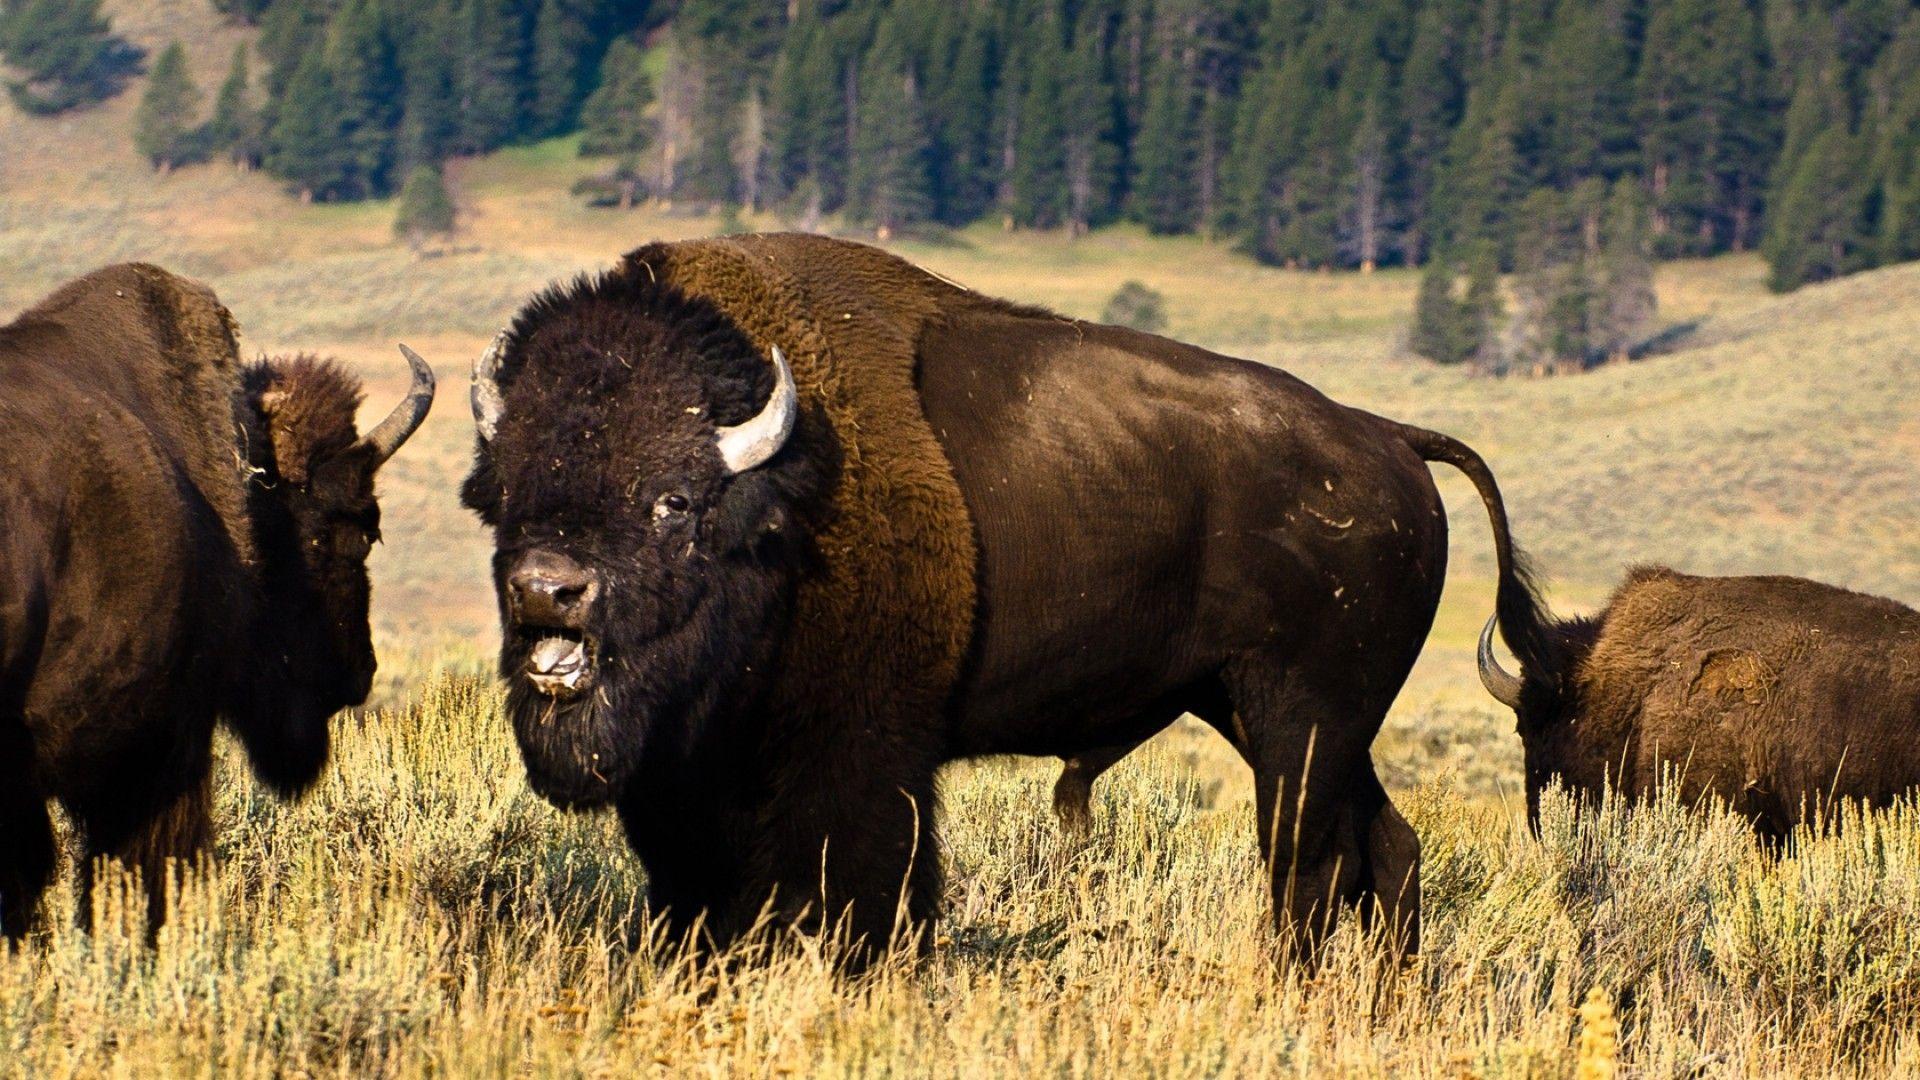 Native American Buffalo Wallpapers - Top Free Native ...